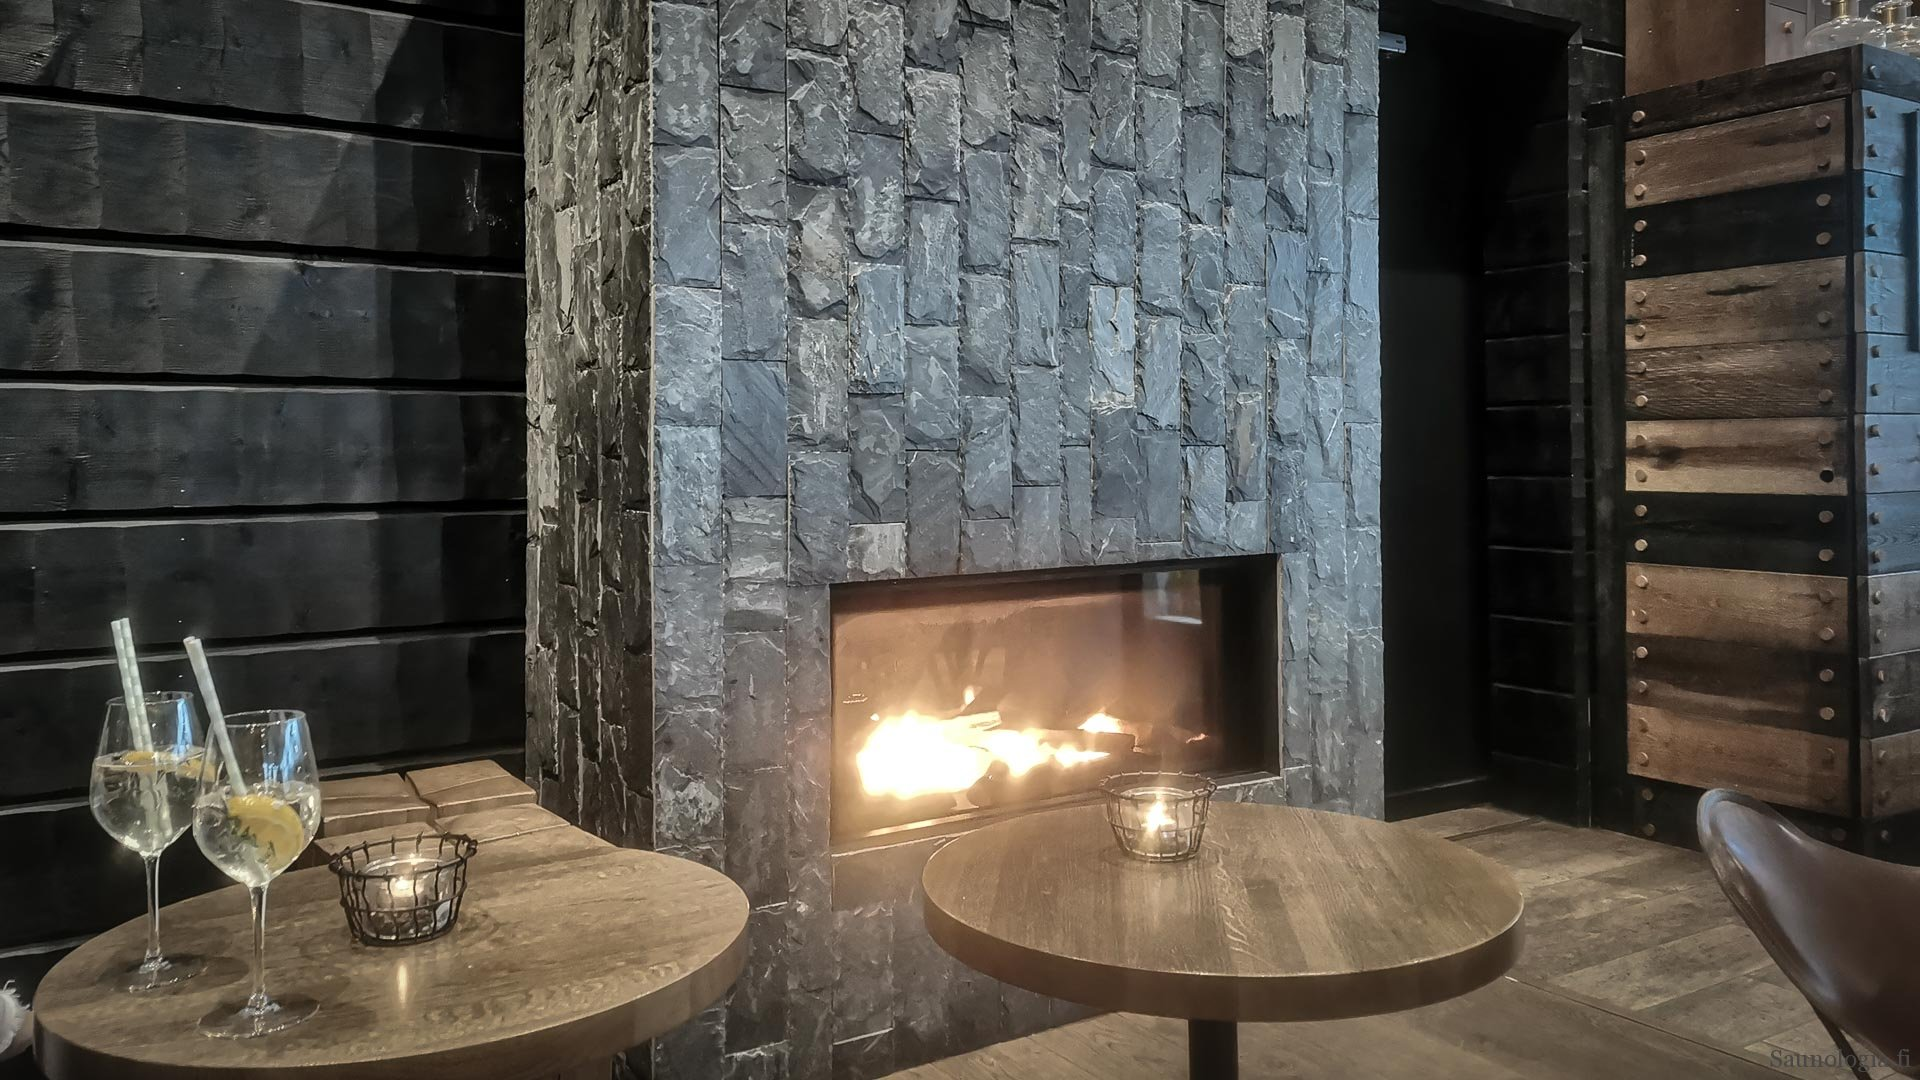 191006-kuuma-saunaravintola-takka-174317